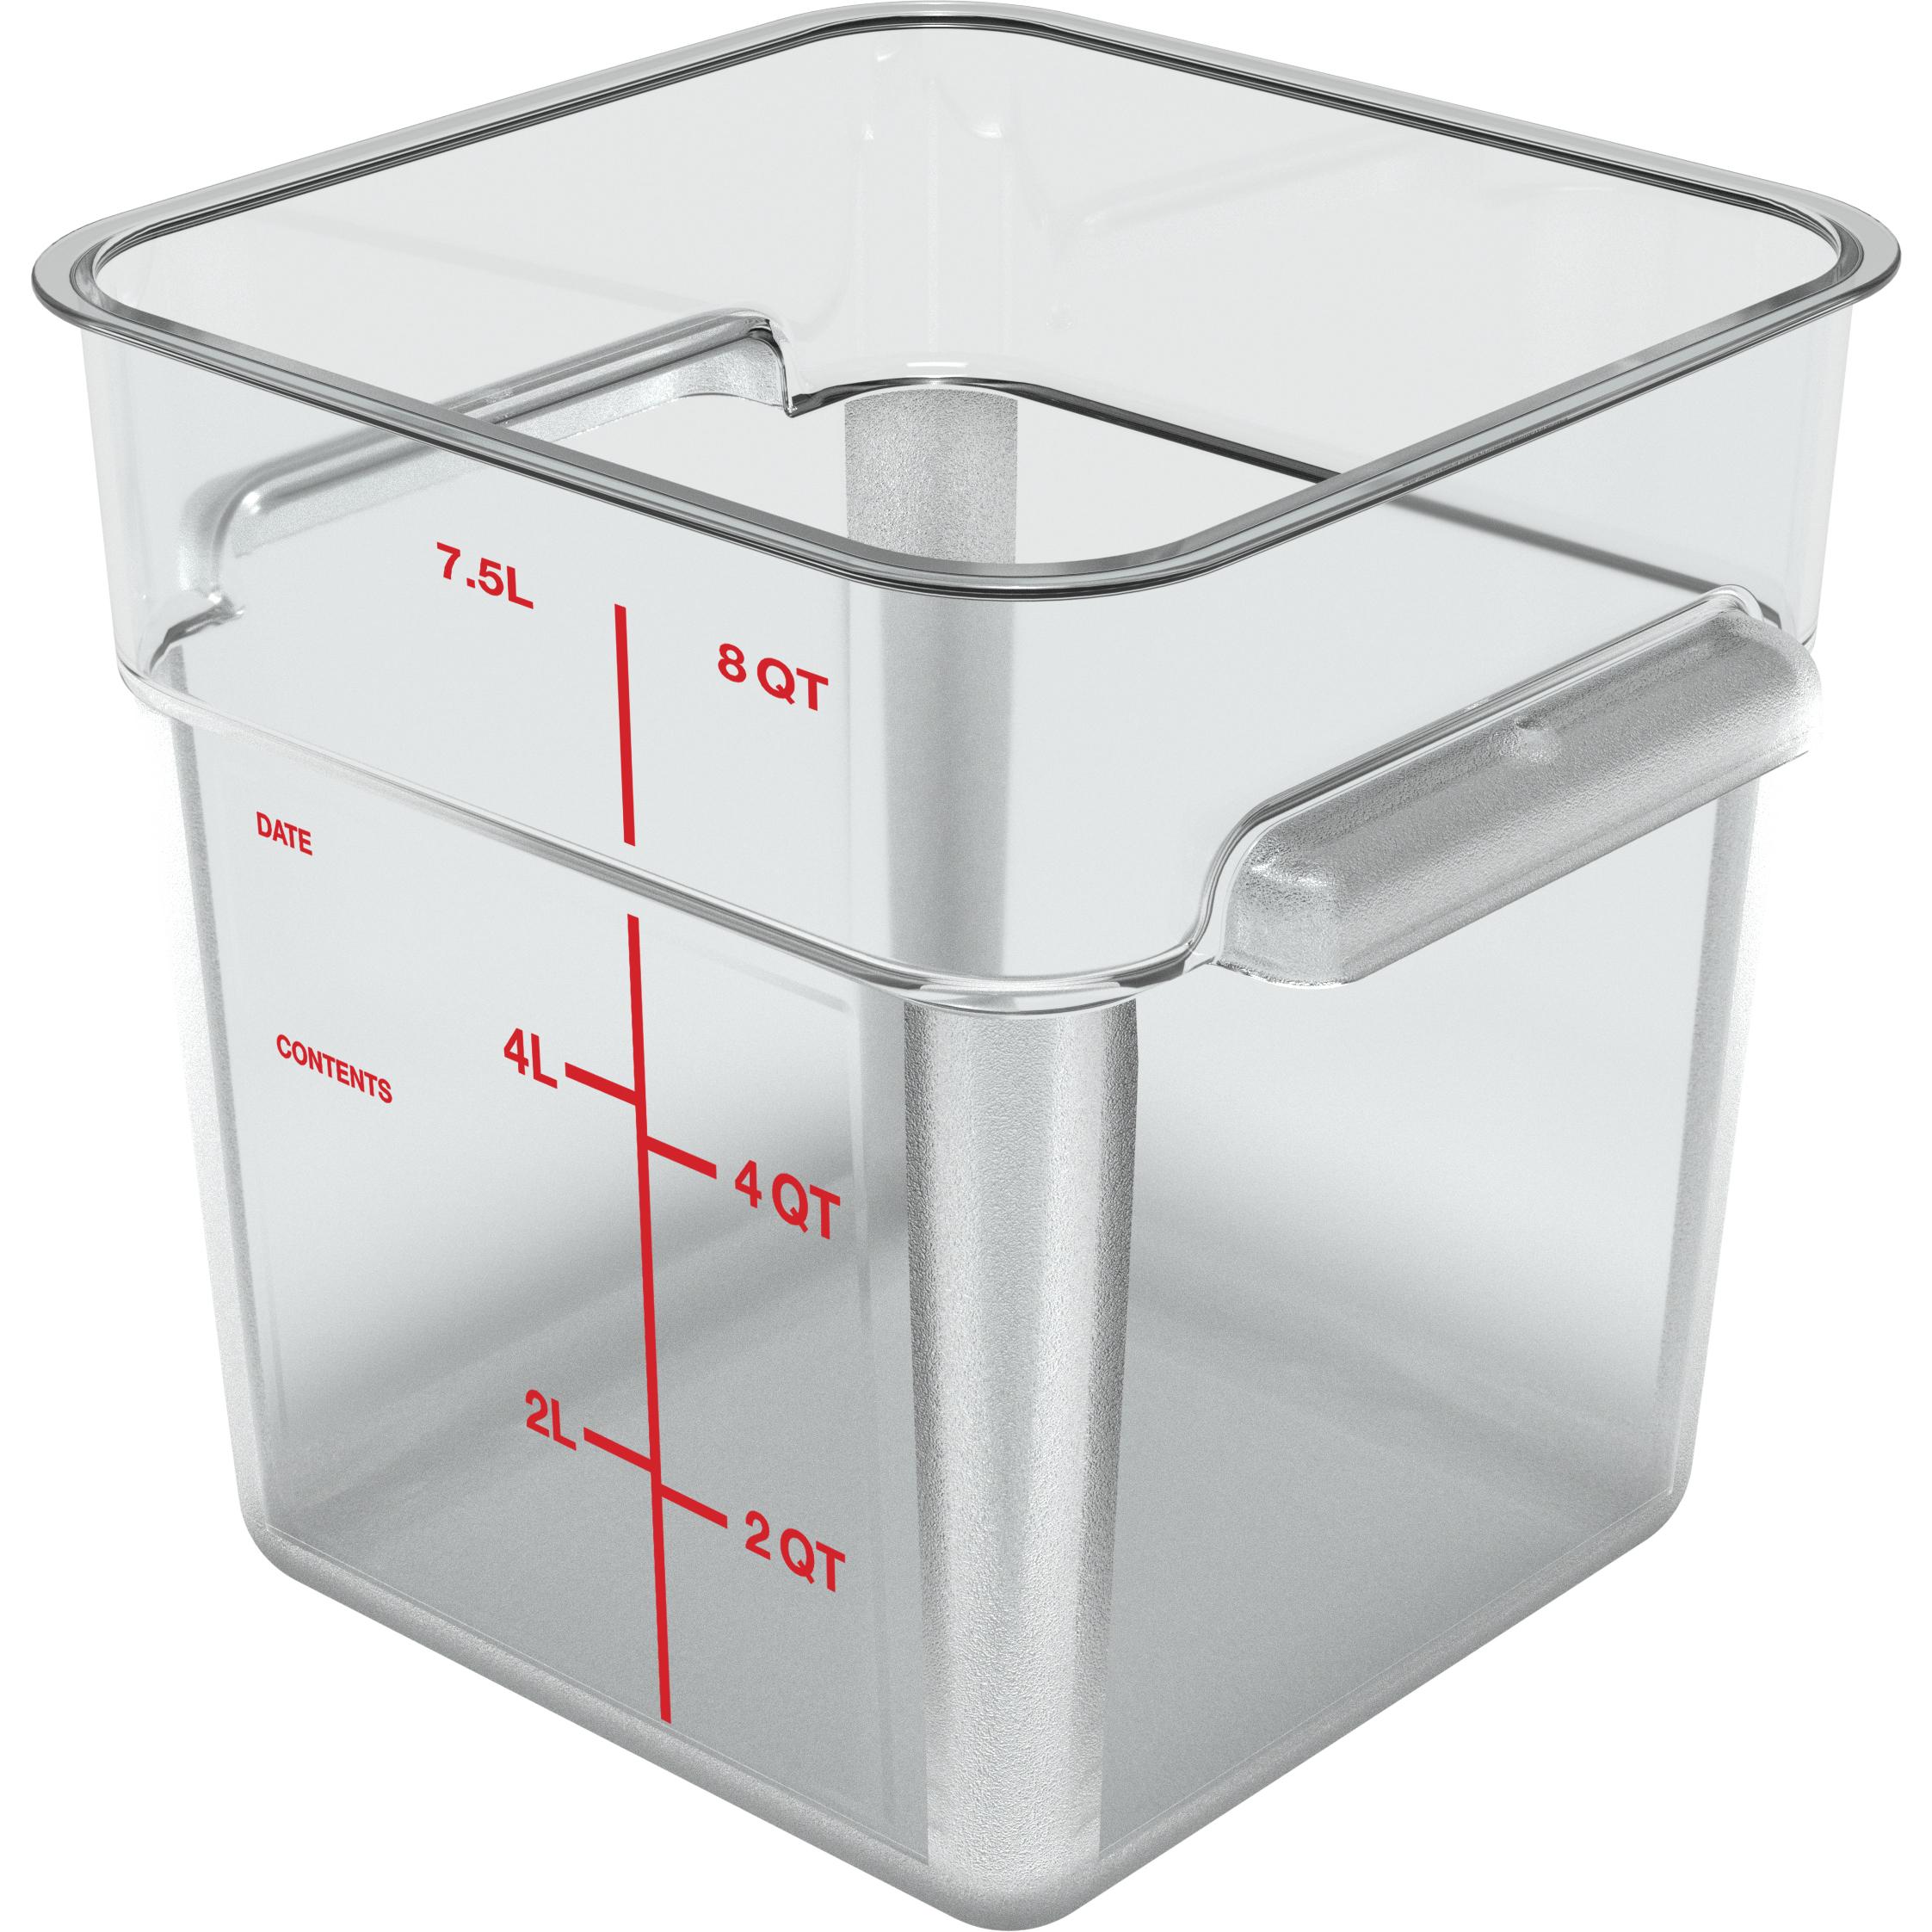 8 Qt. Clear Square Storage Container Carlisle 1195307